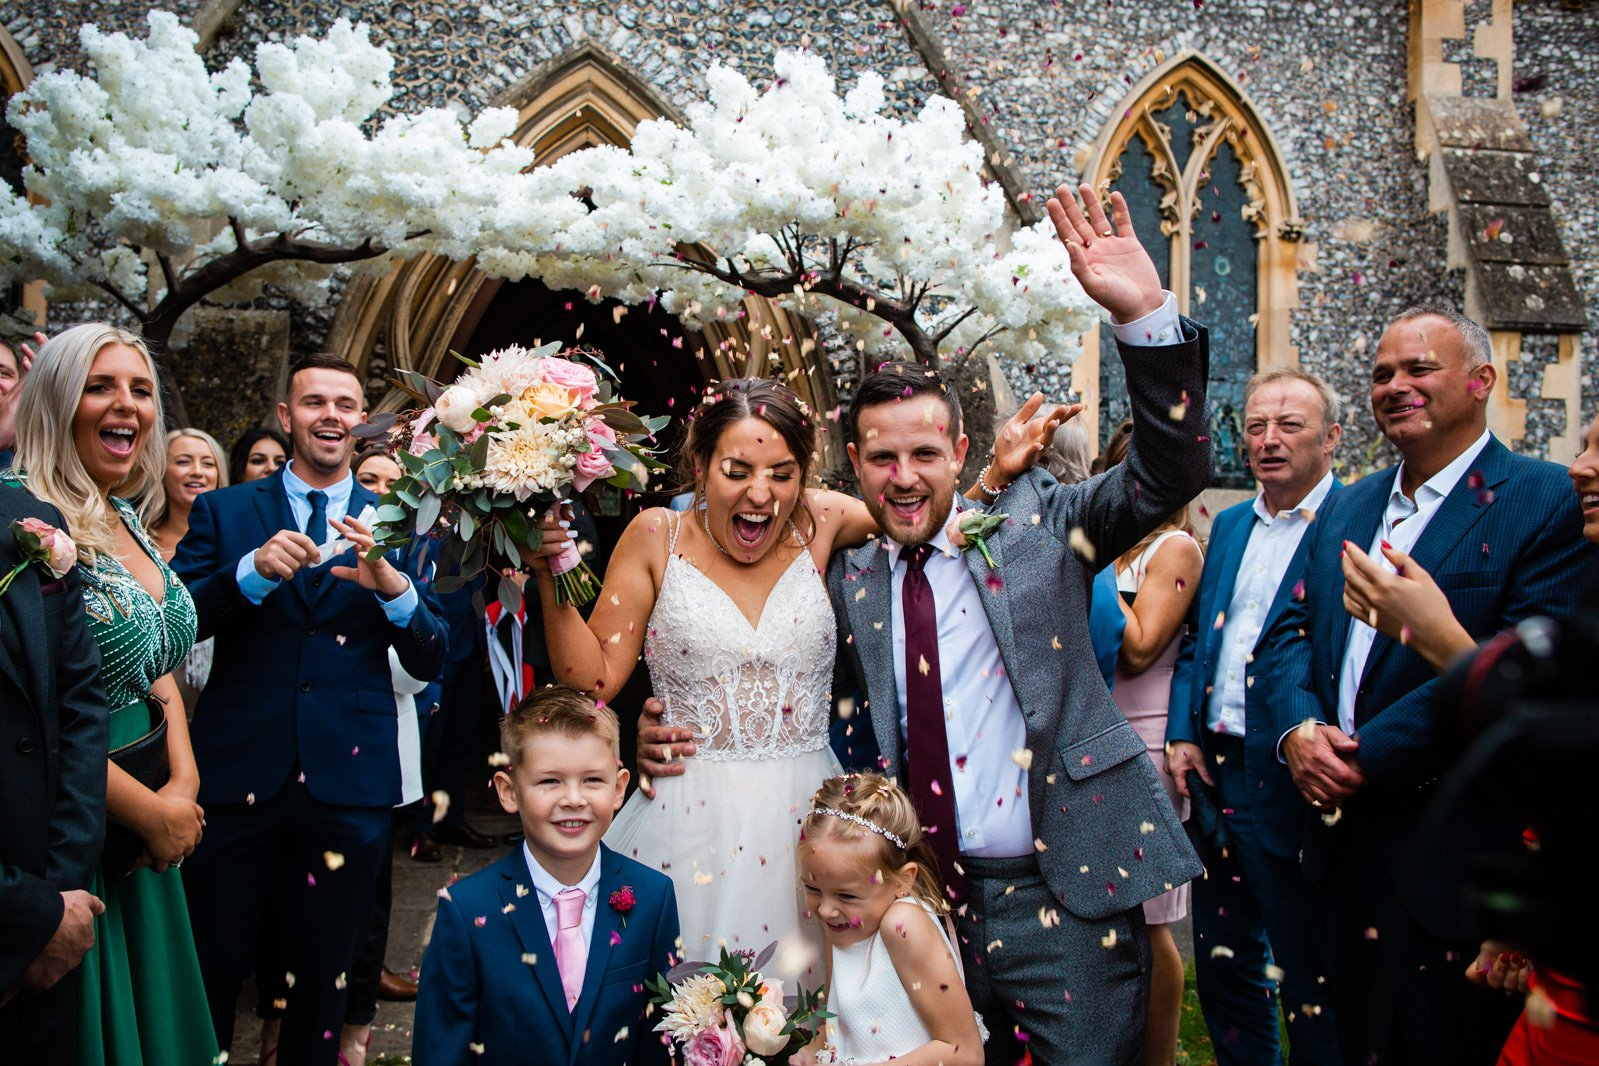 best wedding photos of 2019 57